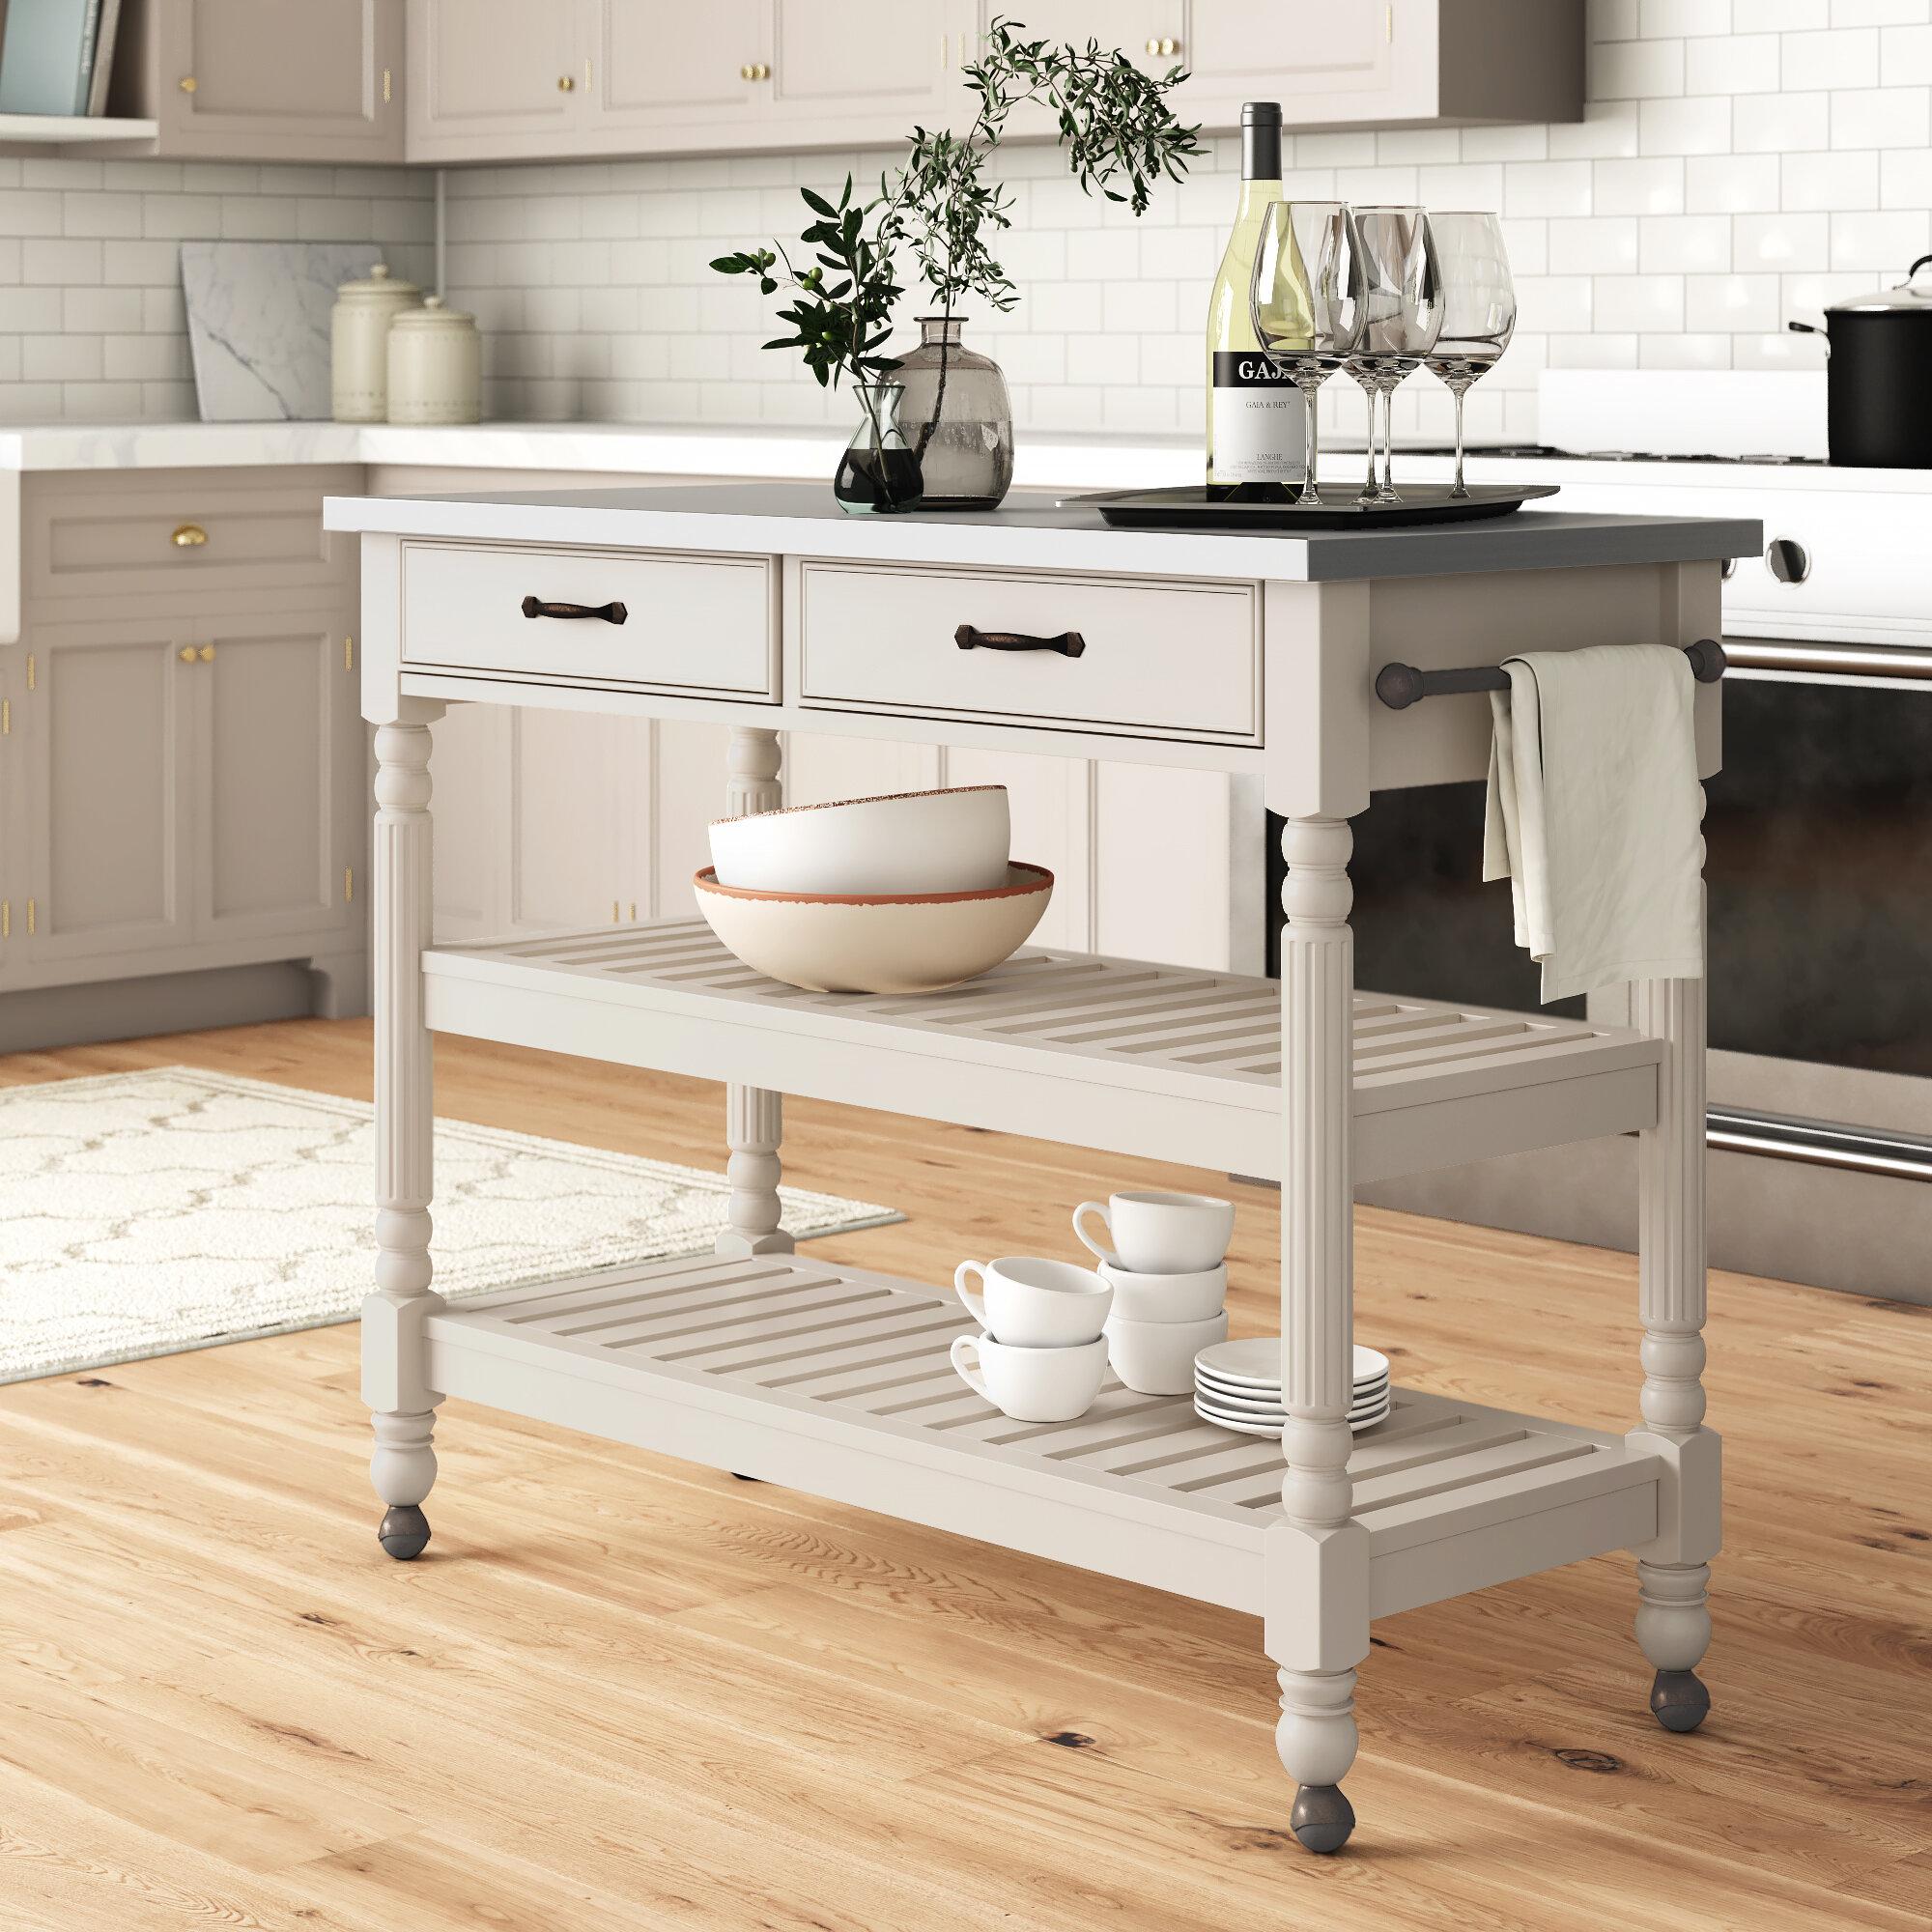 Kitchen Islands Carts You Ll Love In 2020 Wayfair